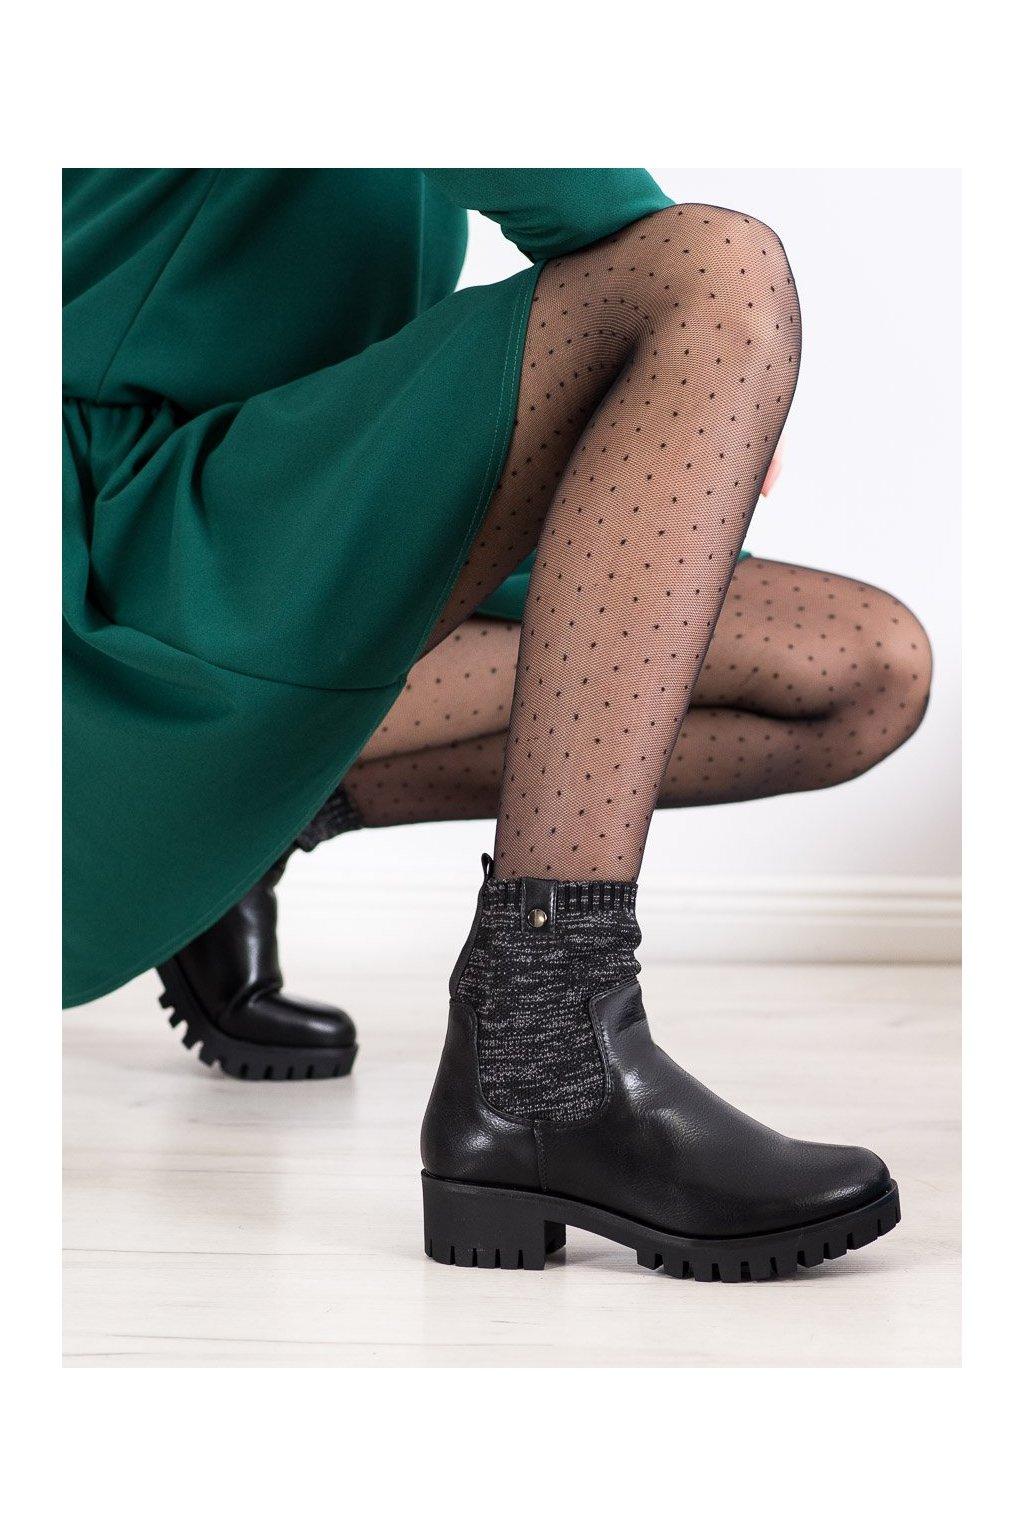 Čierne dámske topánky Daszyński kod MR1813B